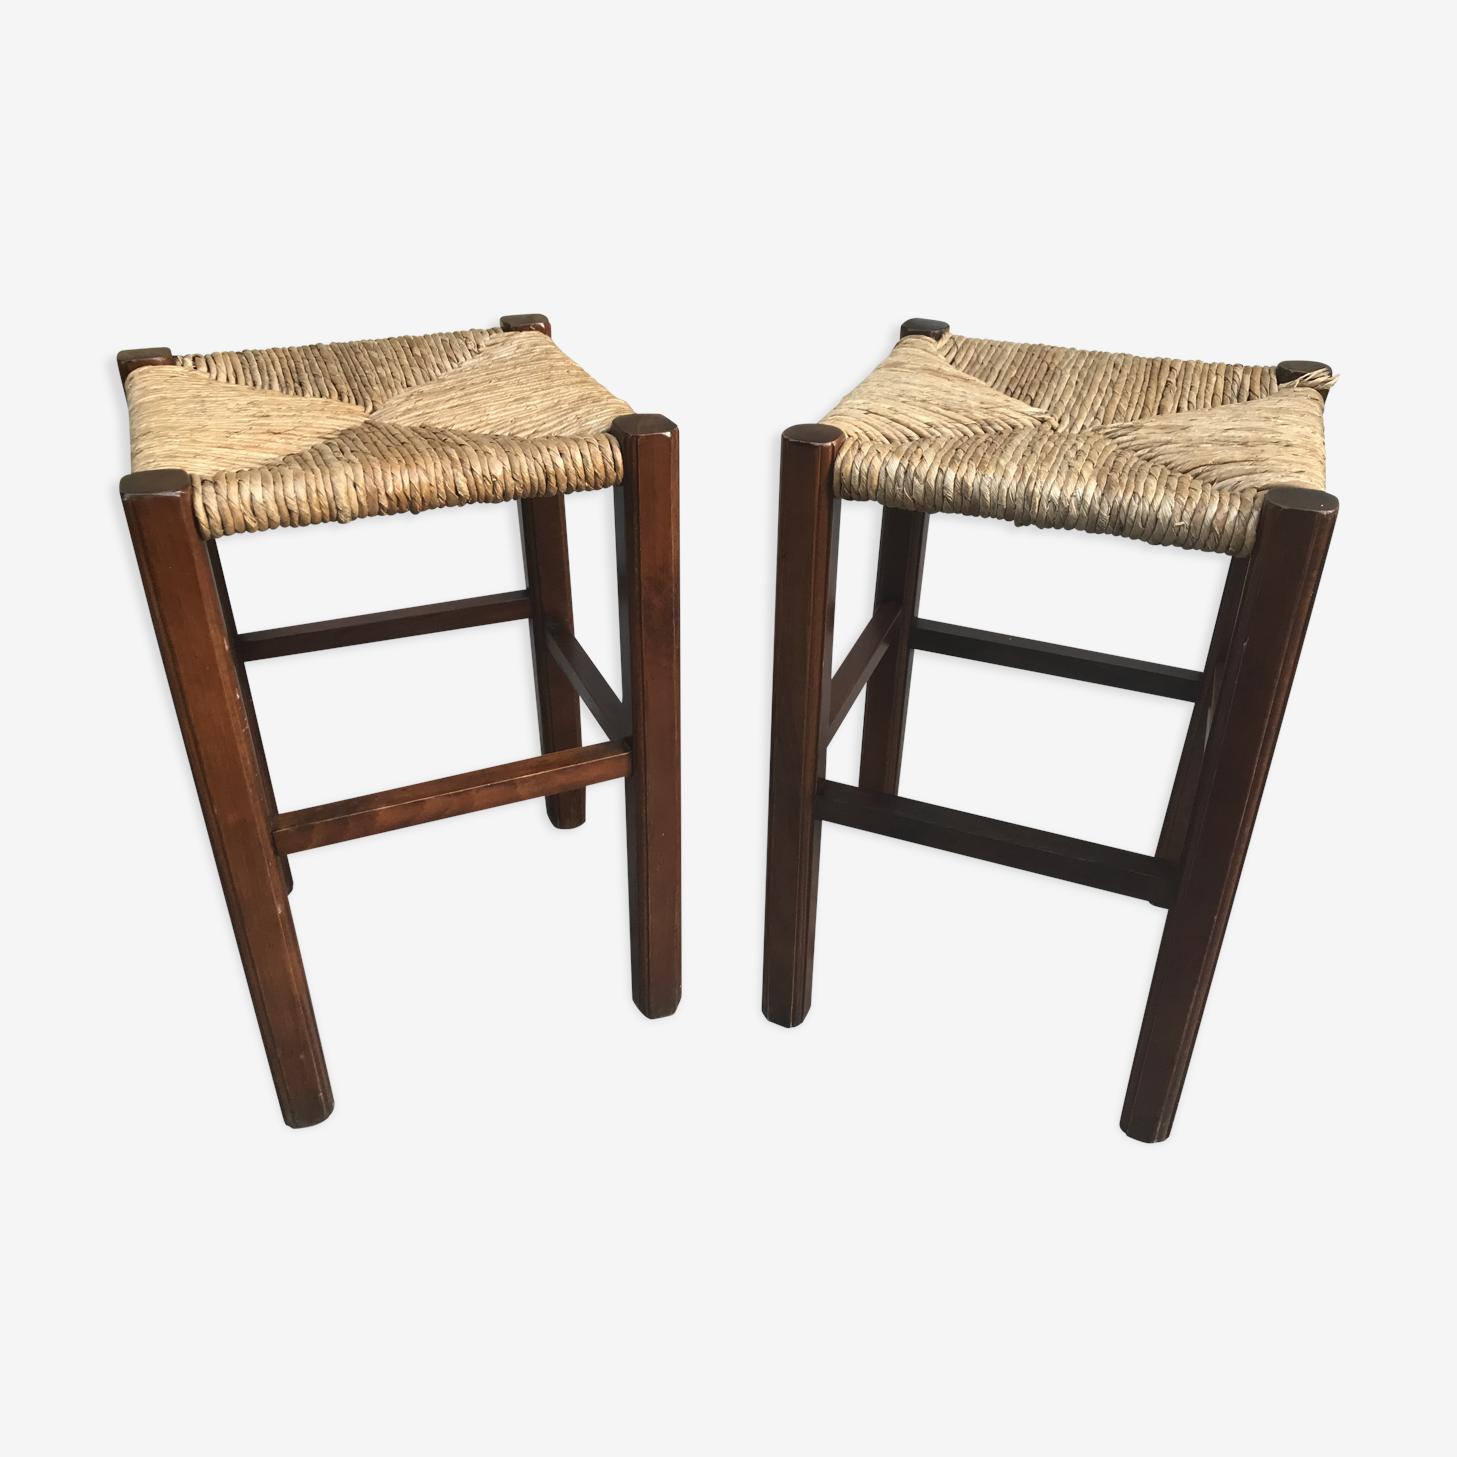 Pair of old stools wood